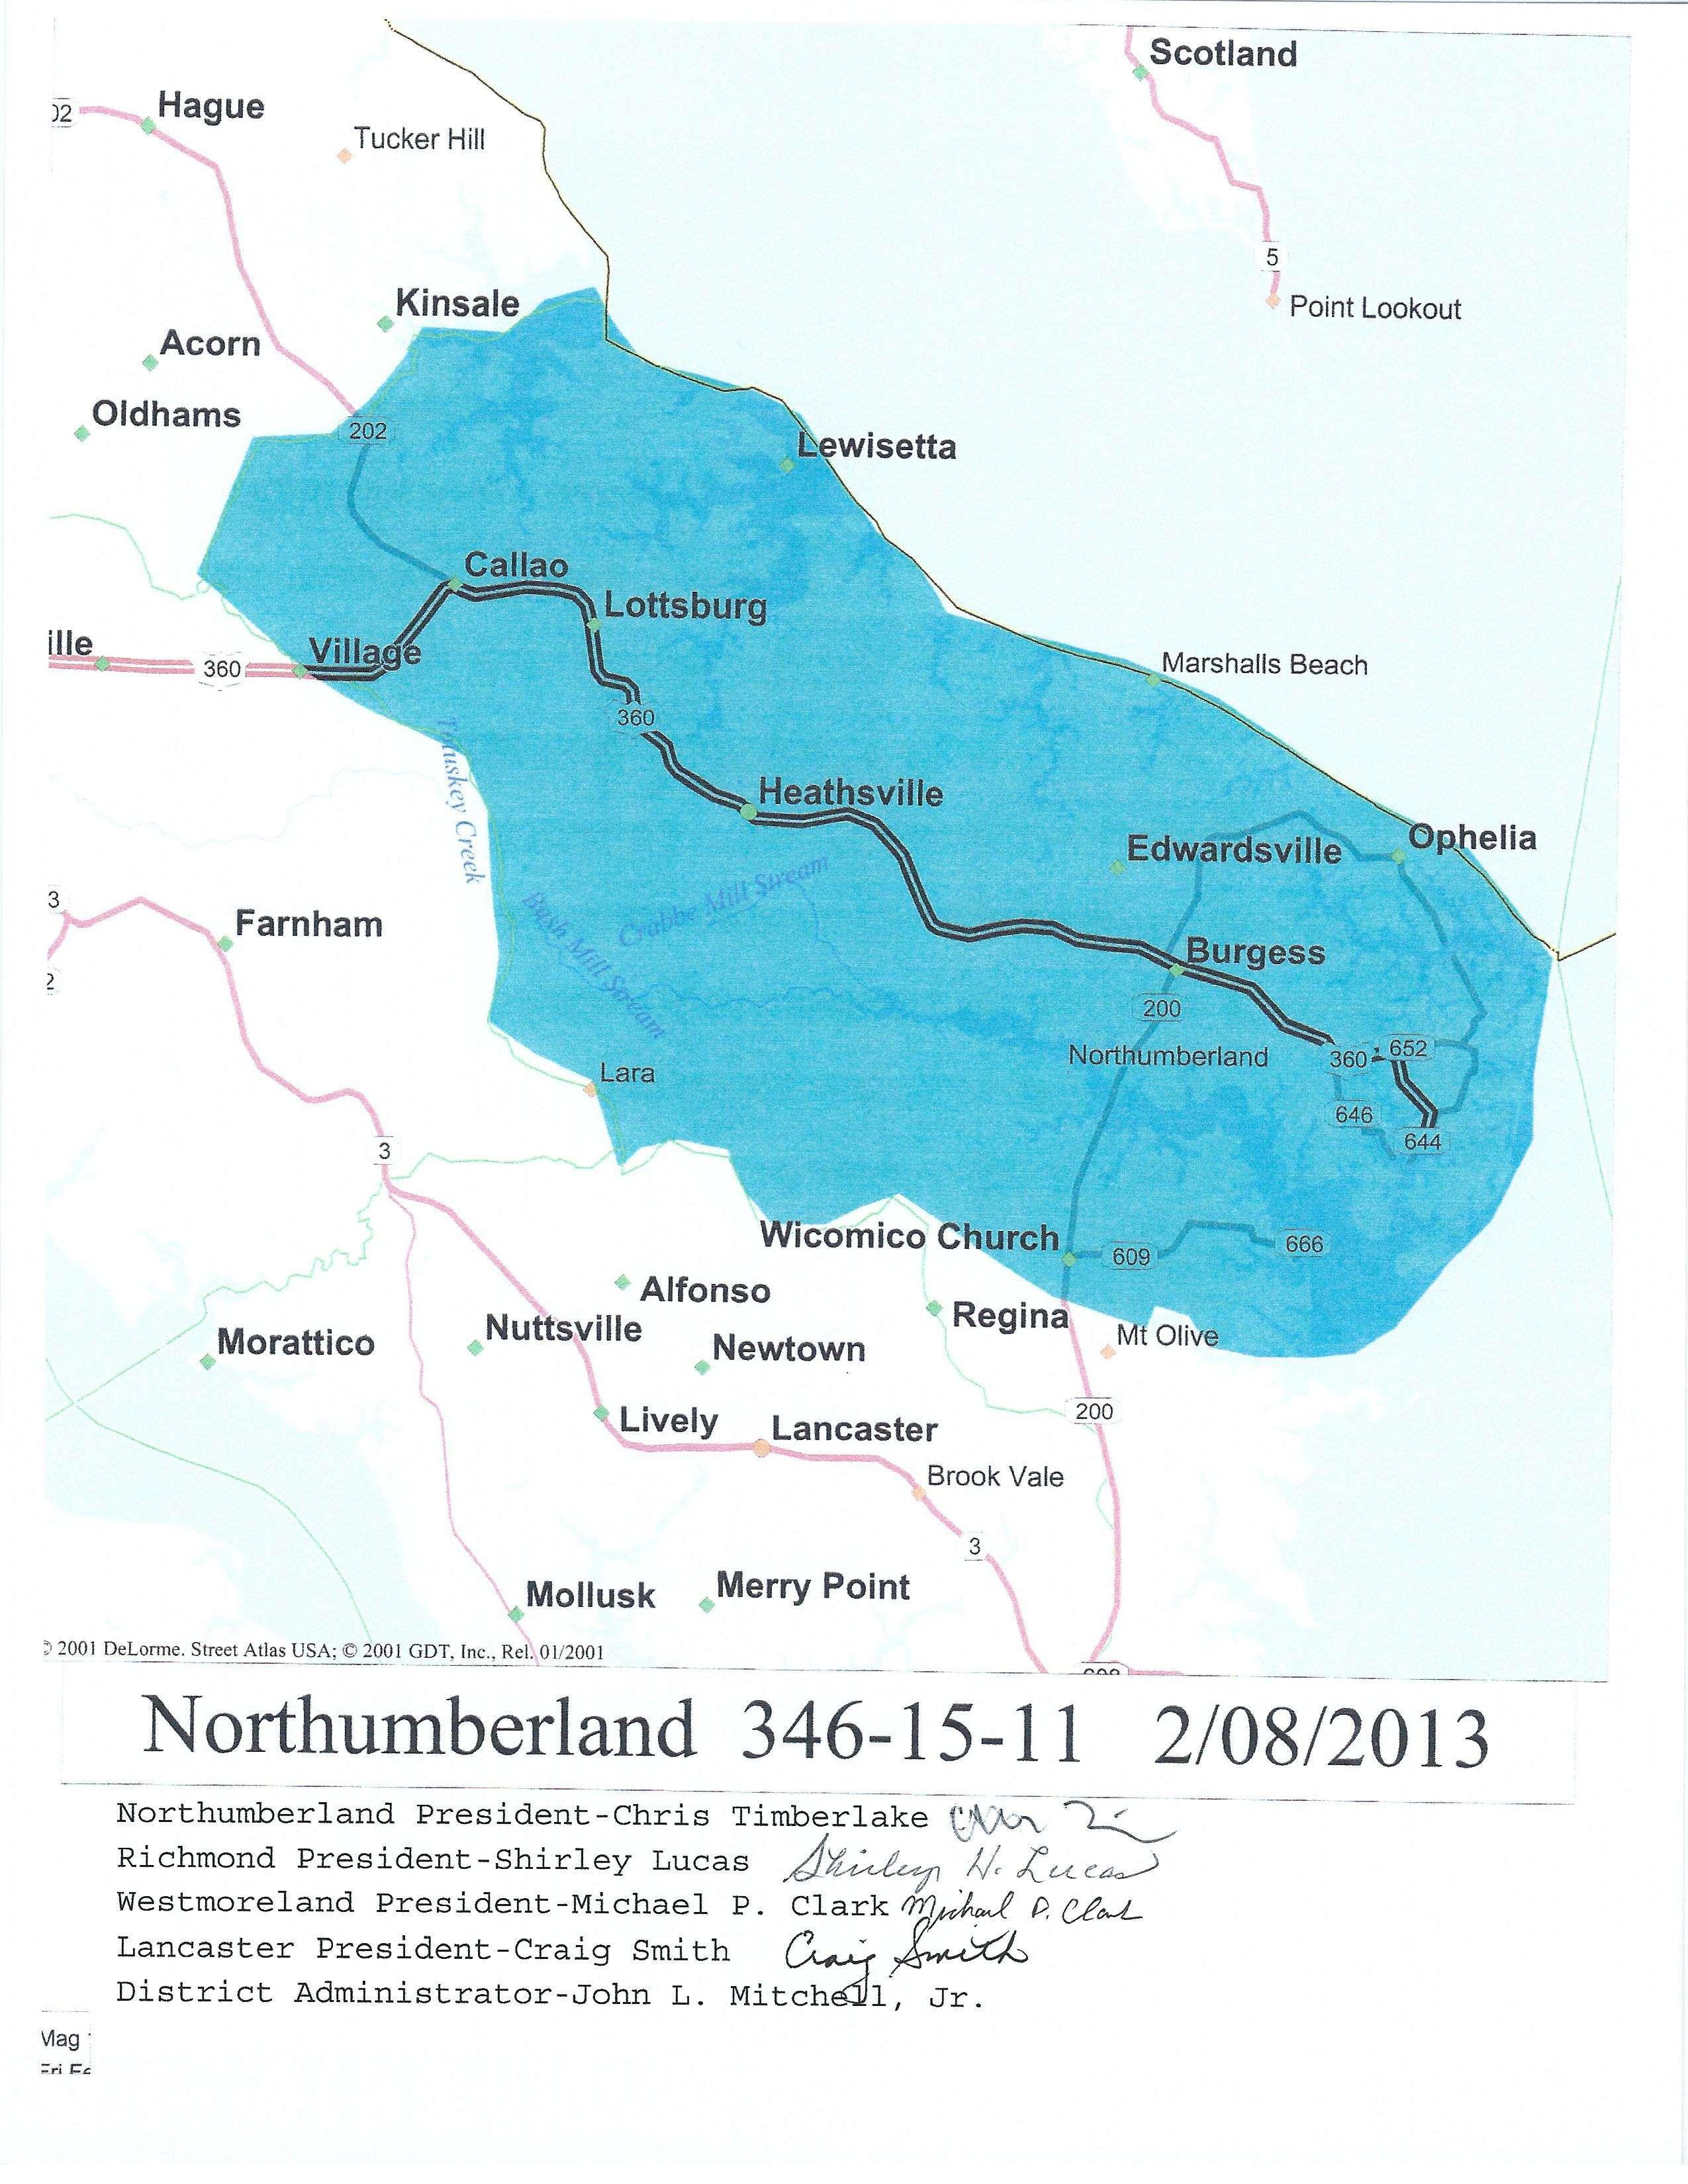 2013 Northumberland.jpg